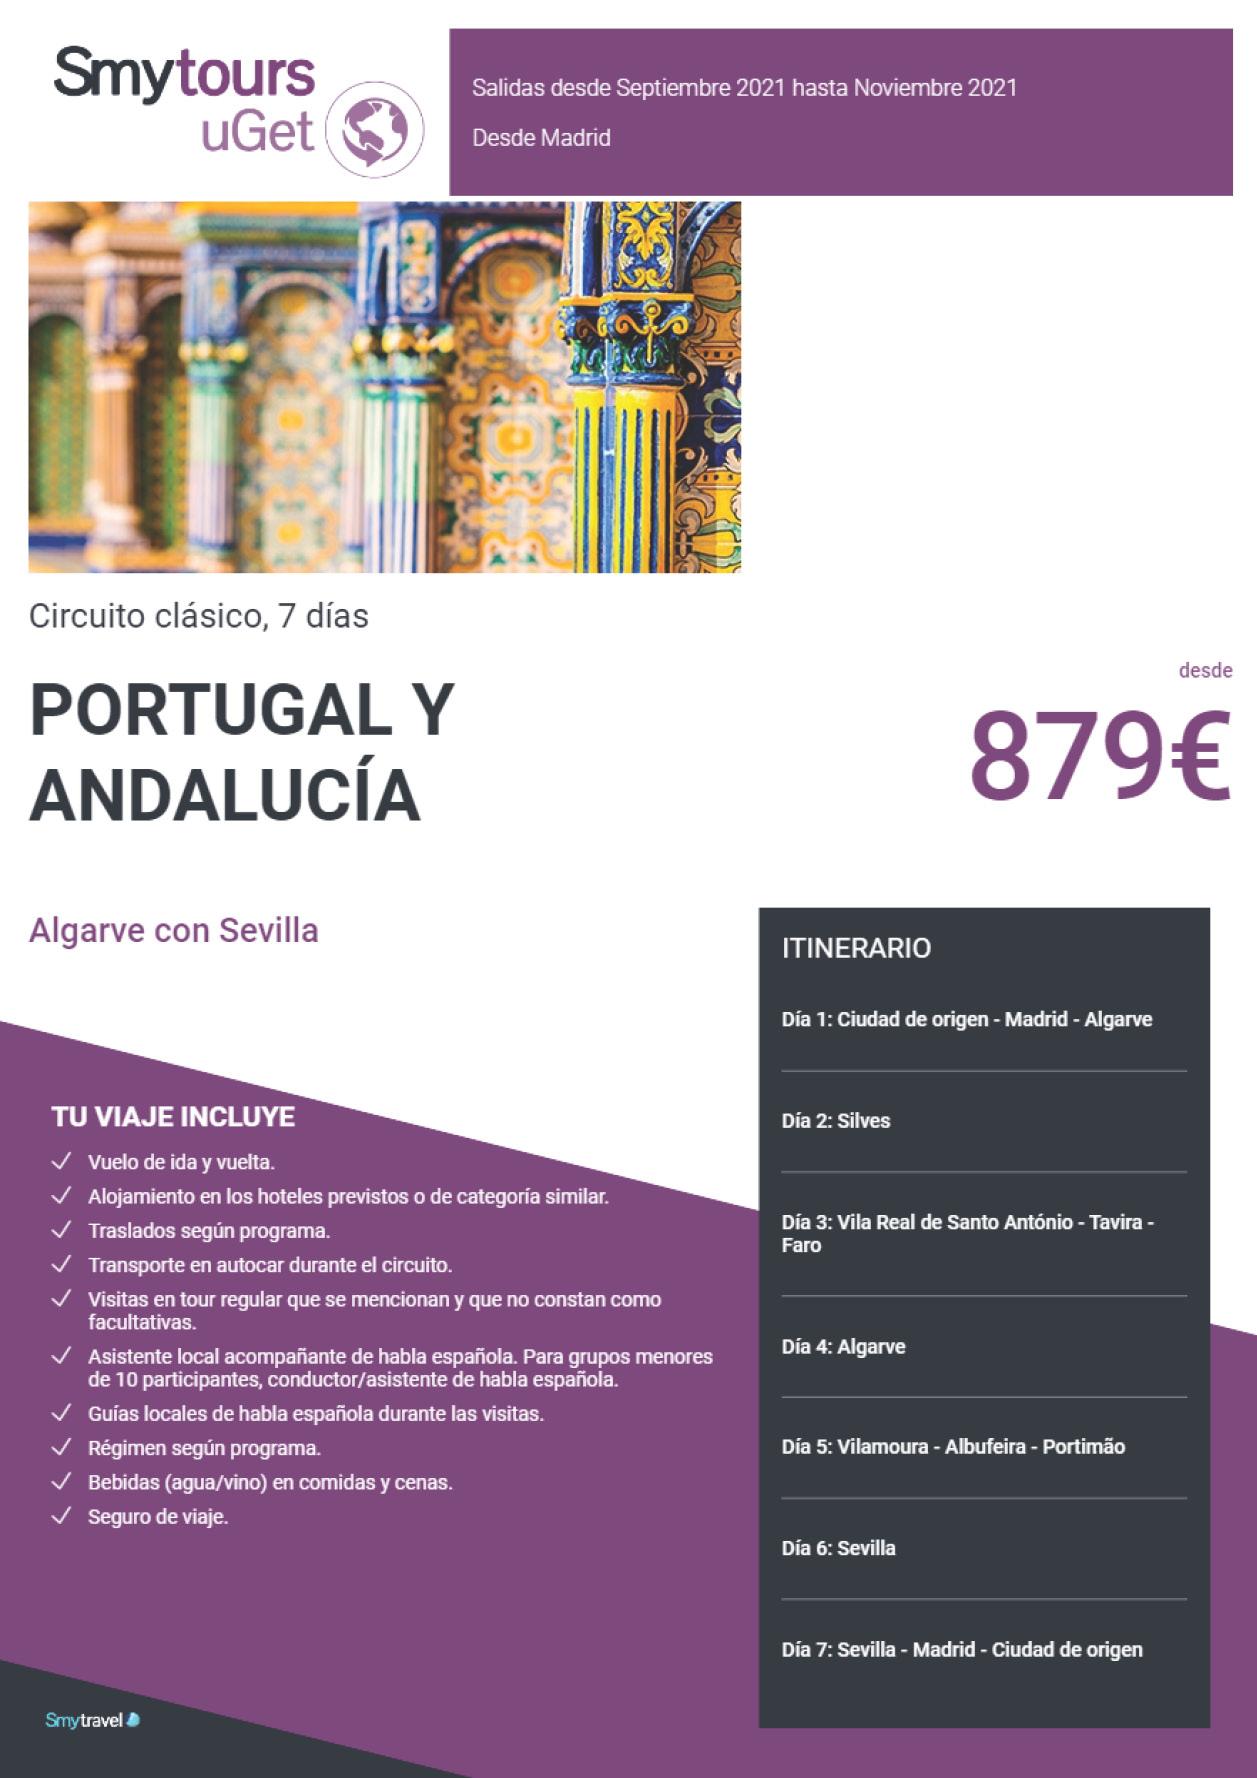 Oferta Smytravel Circuito Algarve con Sevilla 7 dias salidas Barcelona desde 879 €